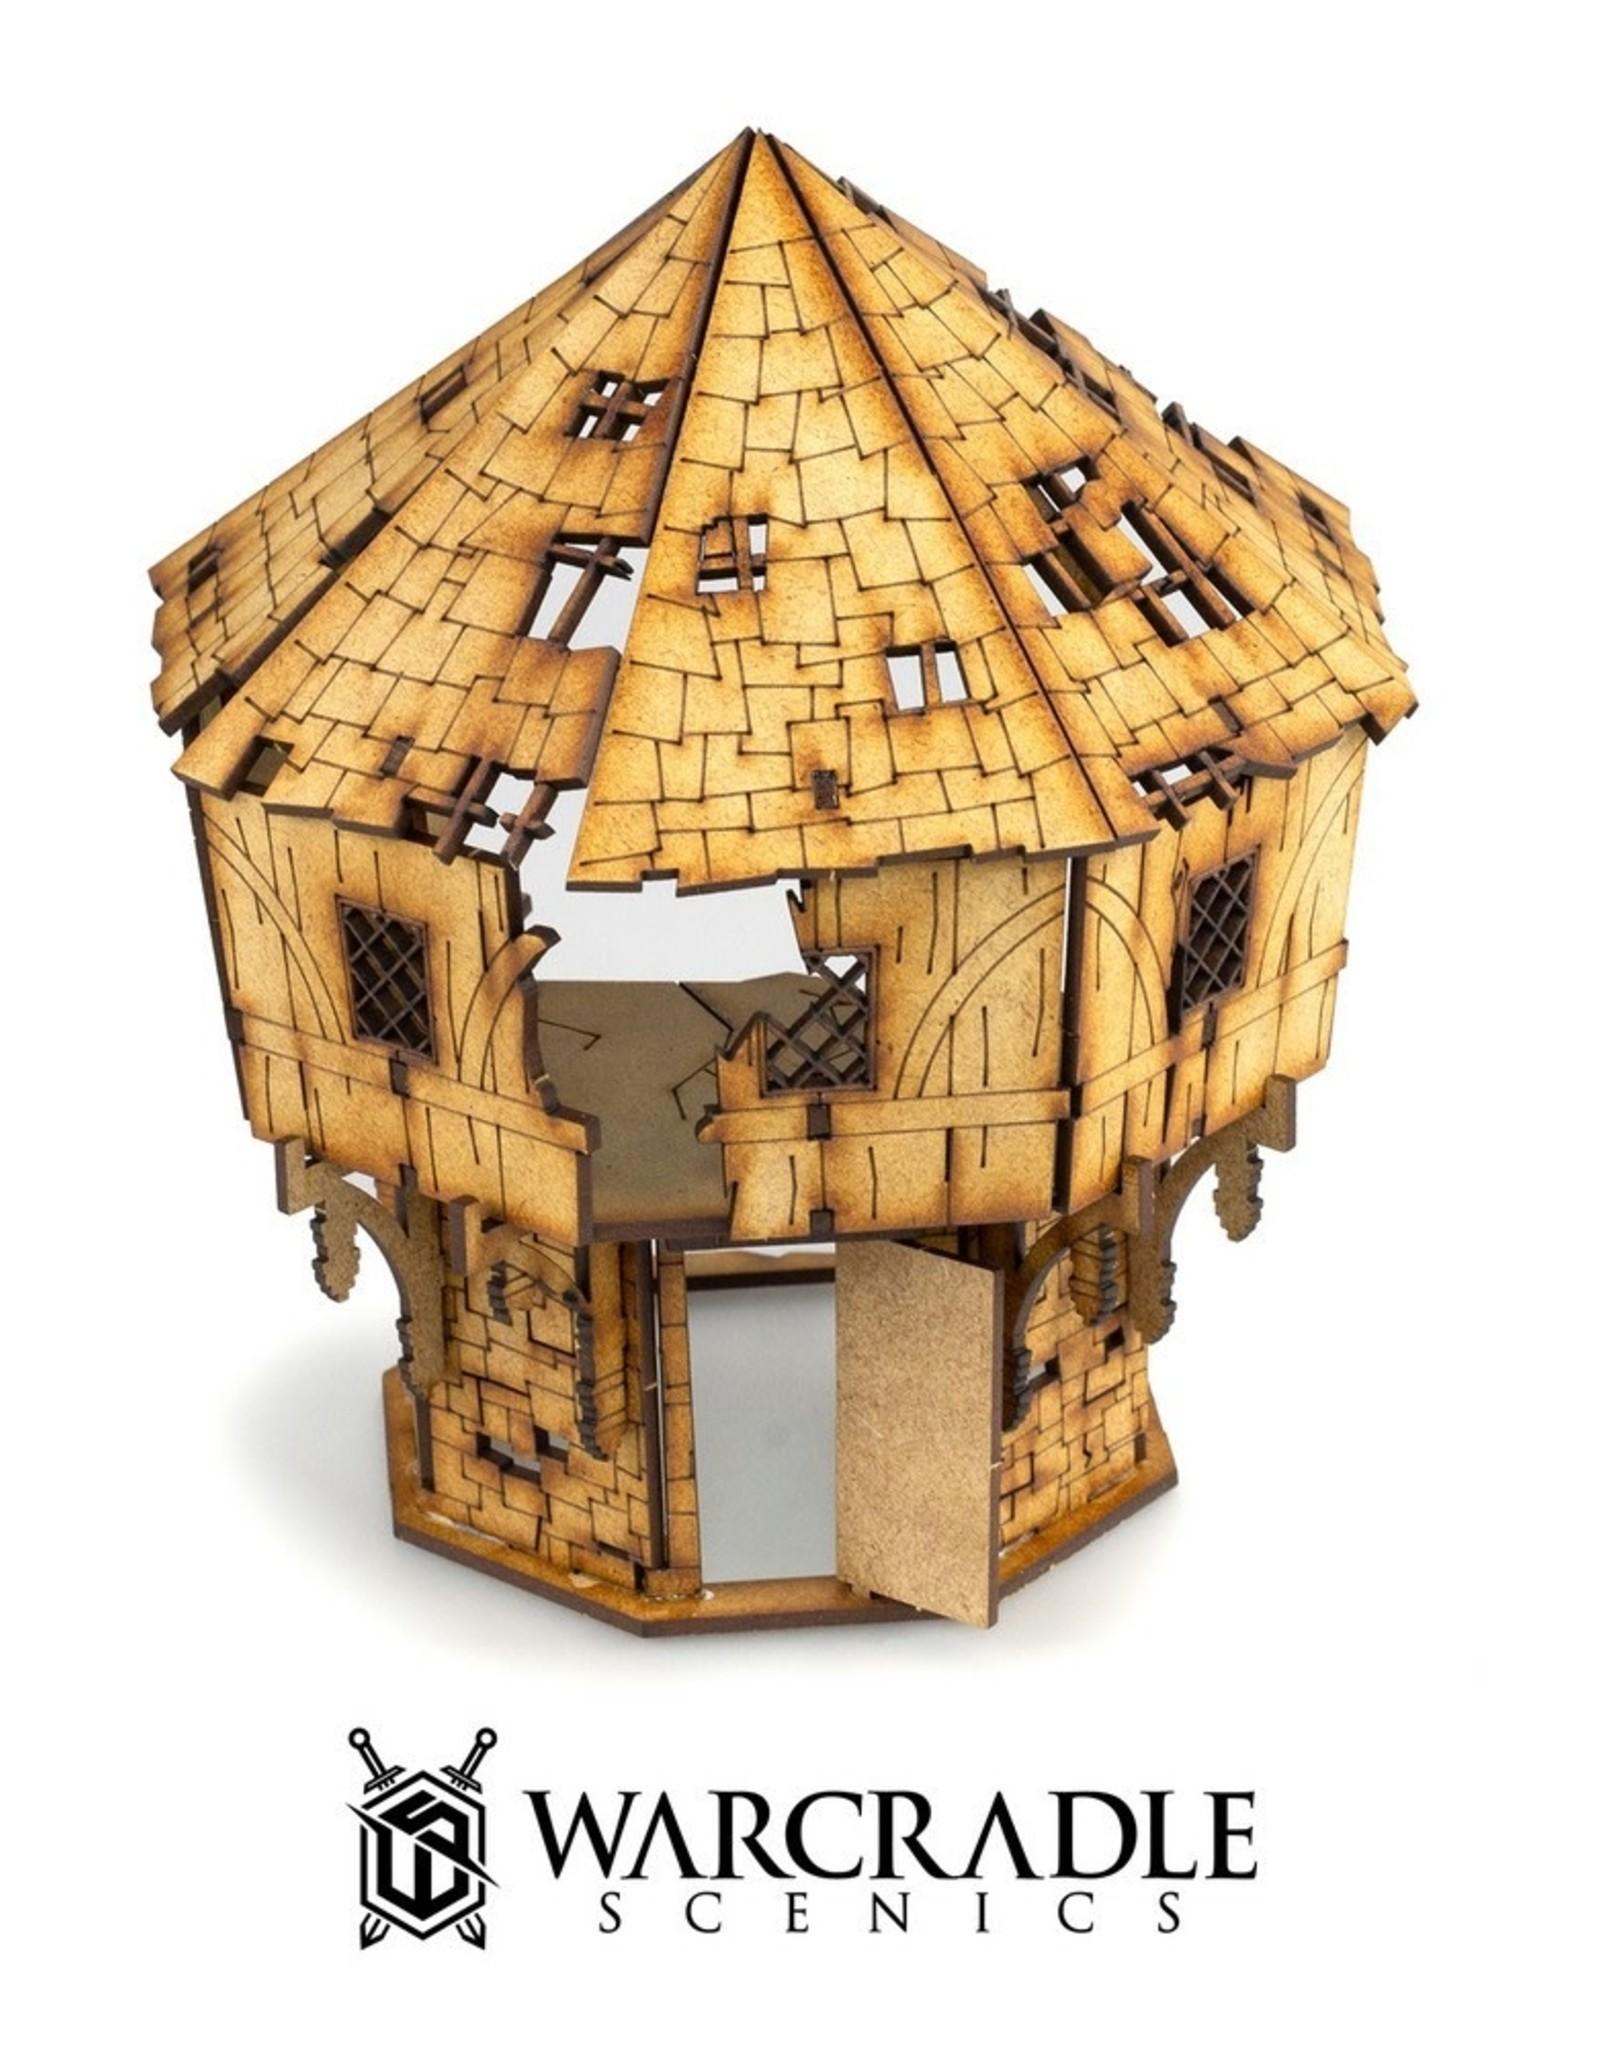 Warcradle Gloomburg: Ruined Tower Top